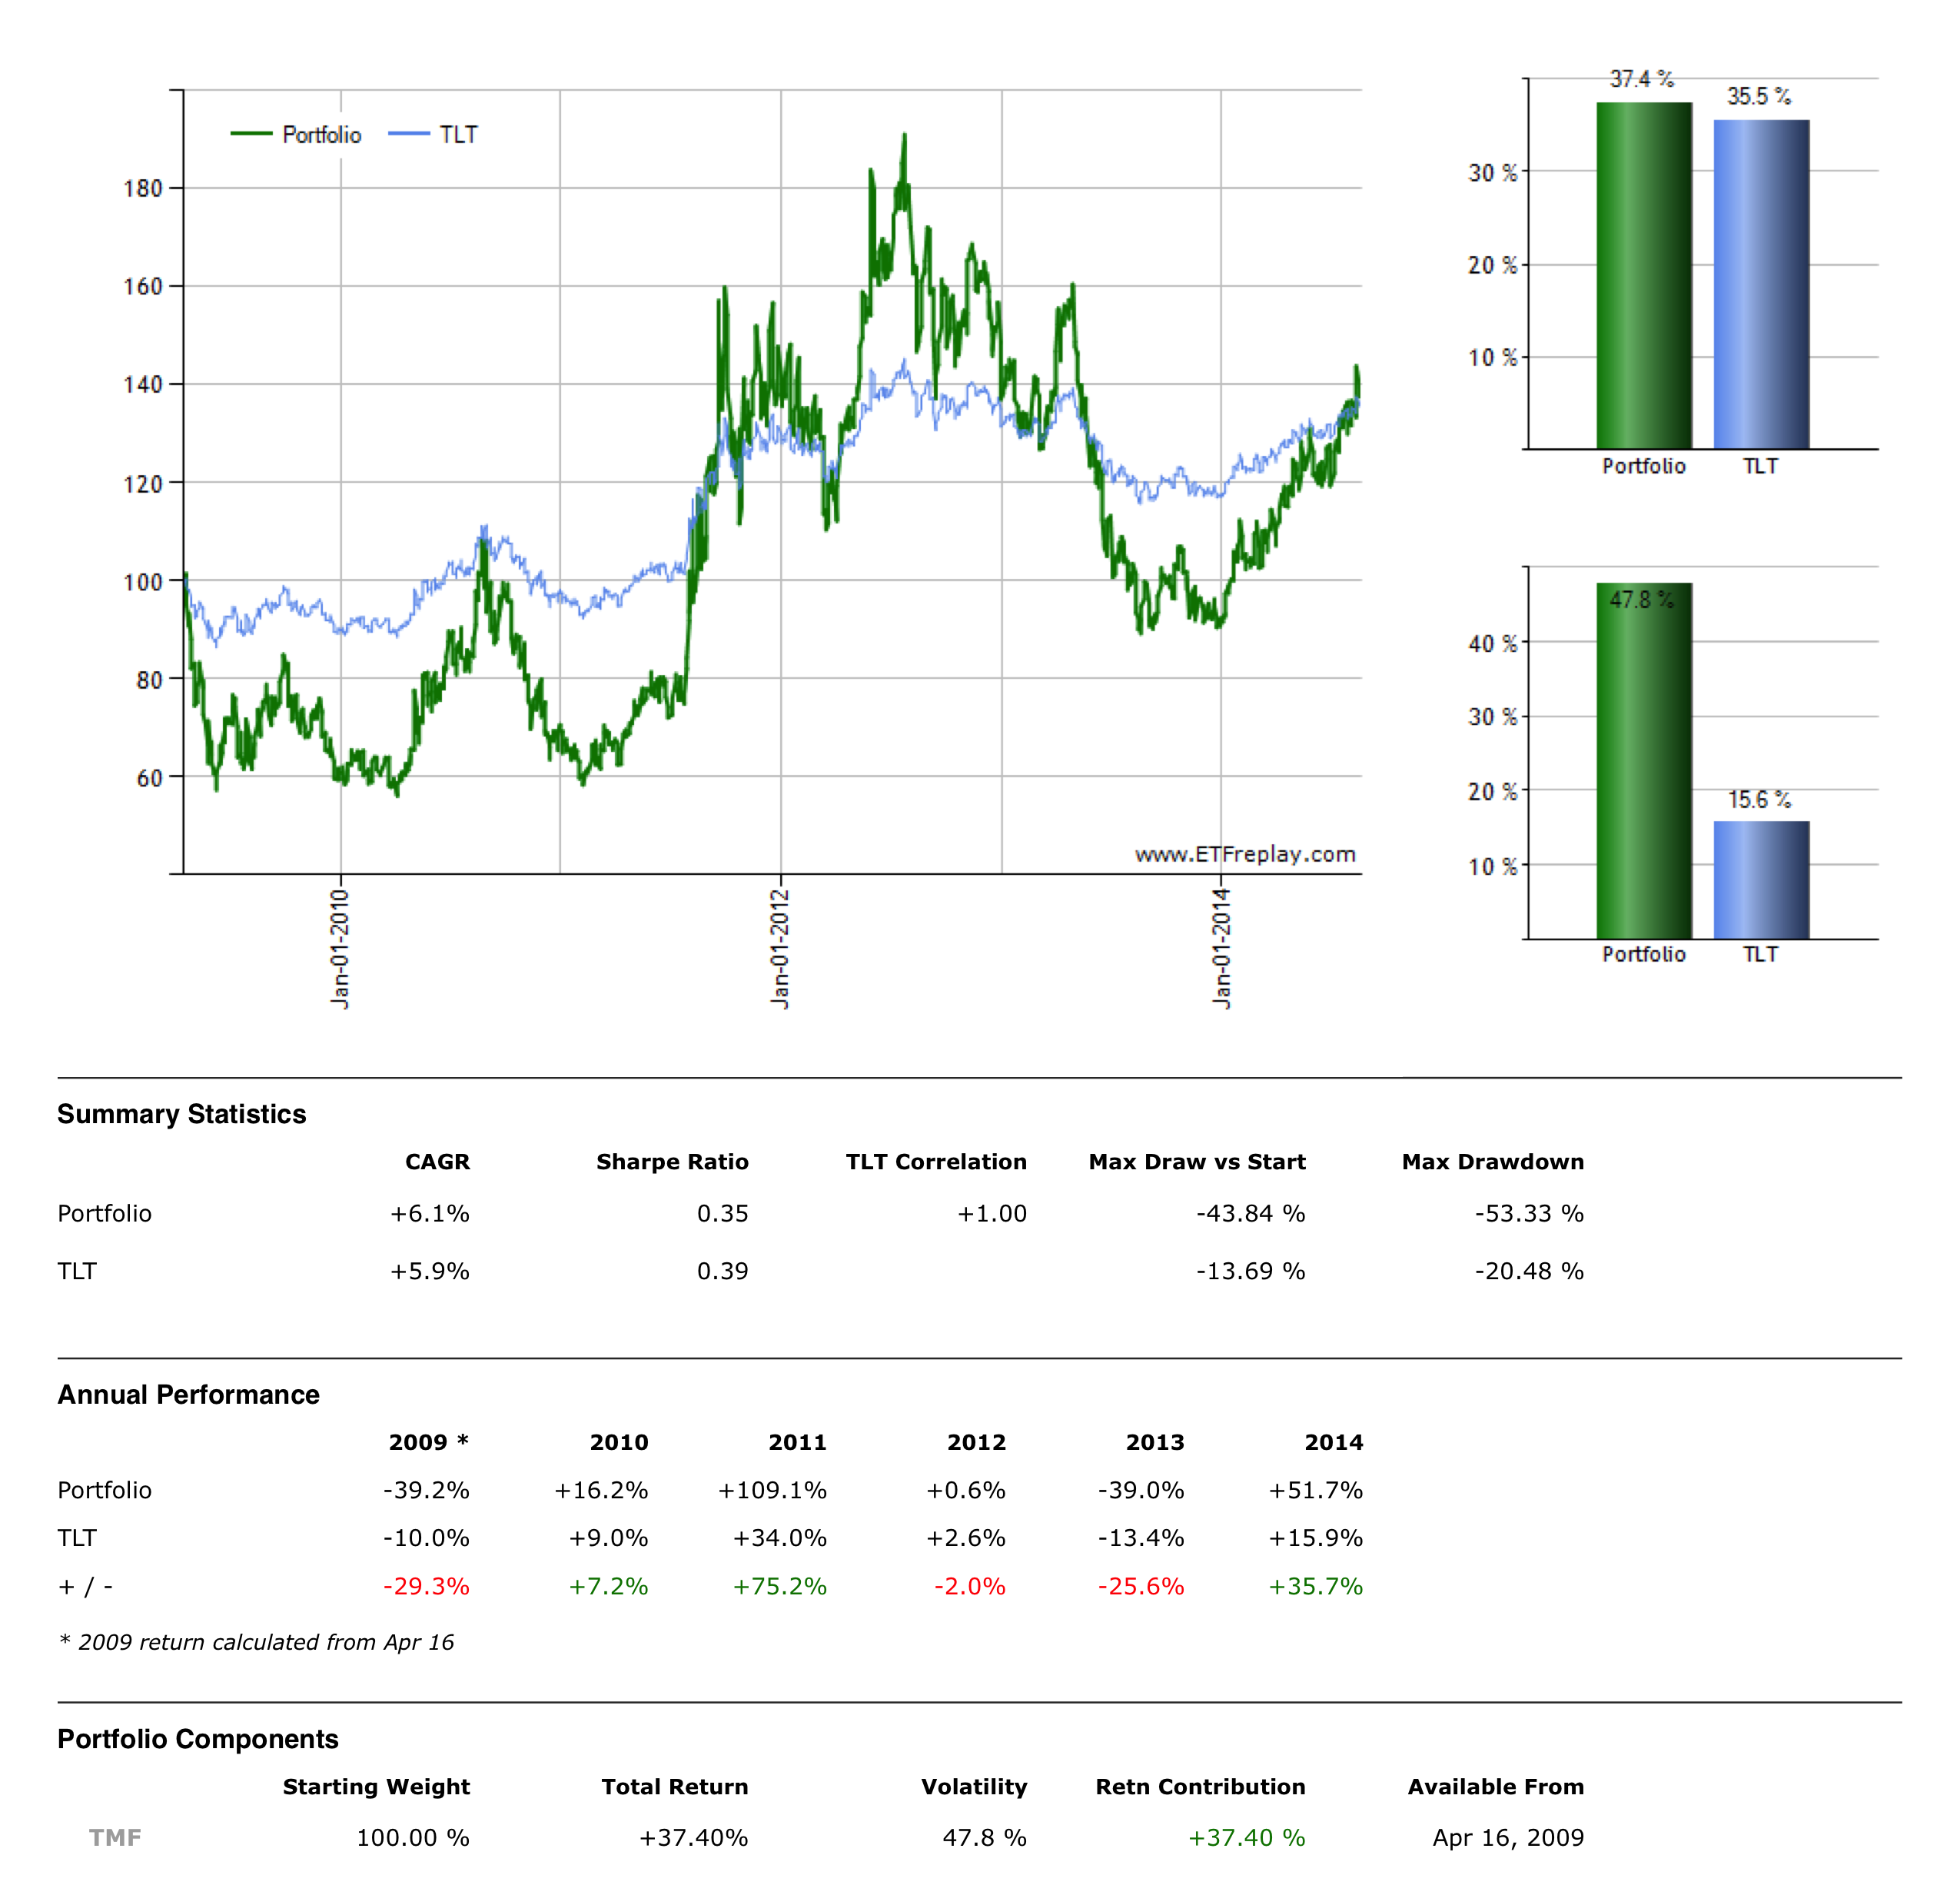 Spxs Quote Benefits Of Short Selling Inverse Leveraged Etfs  Seeking Alpha